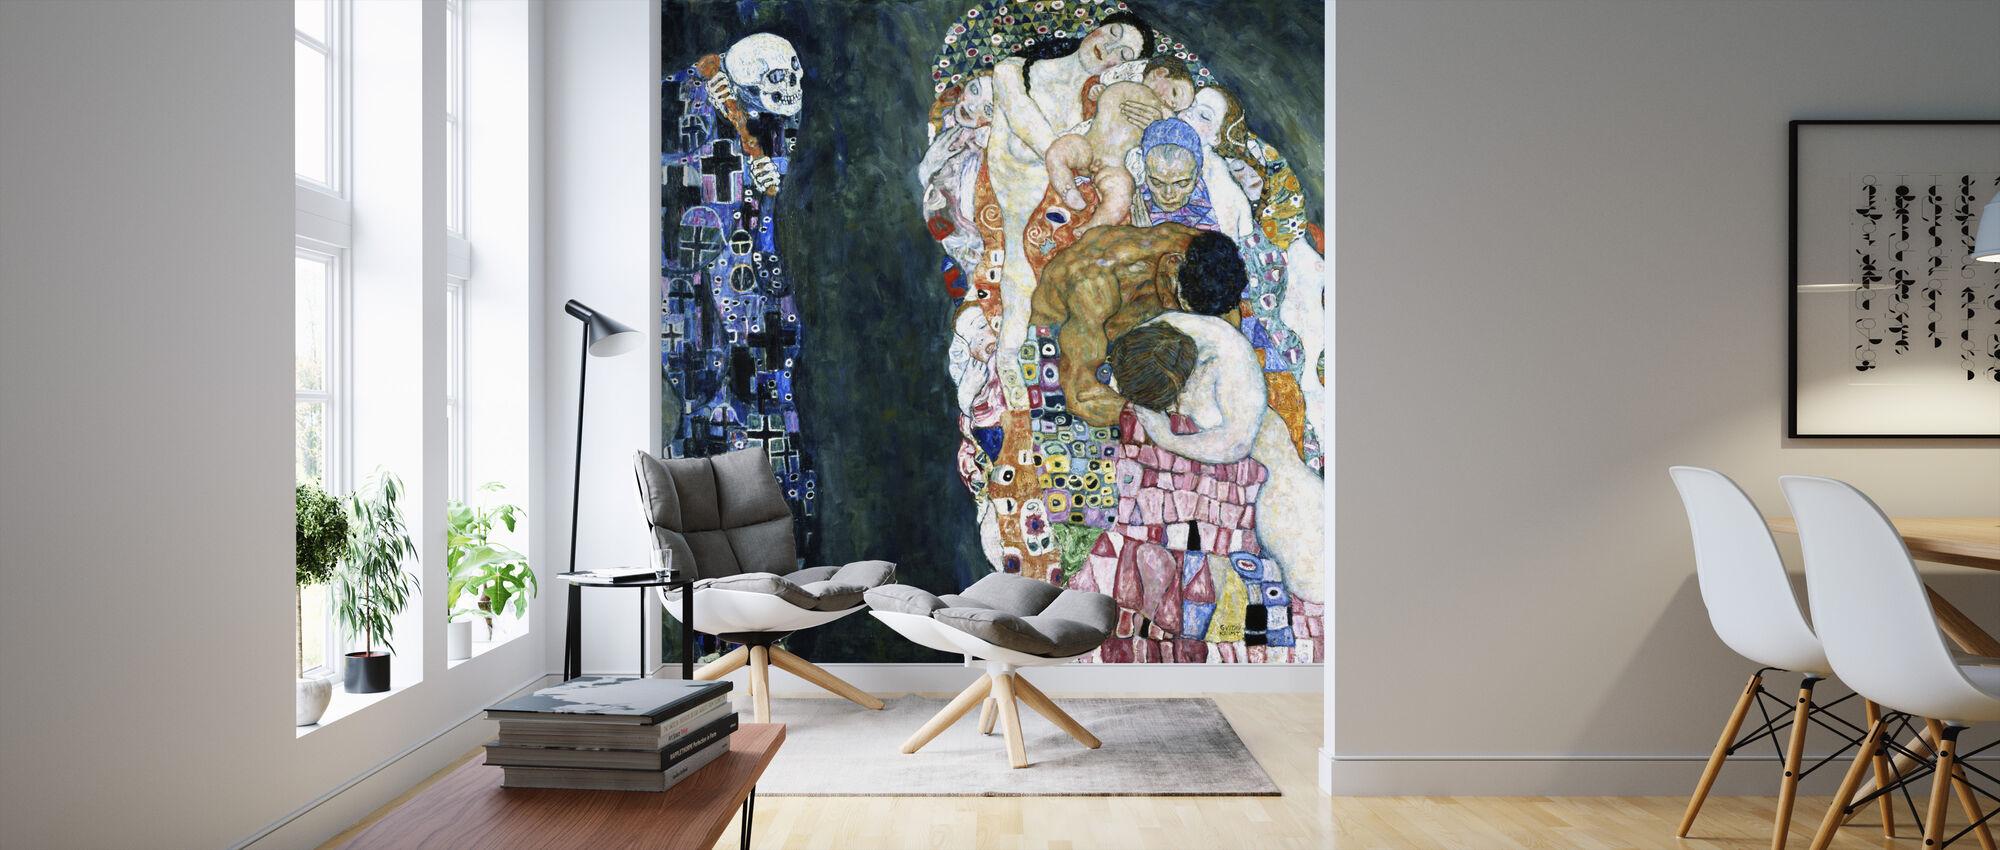 Mort et vie - Gustav Klimt - Papier peint - Salle à manger